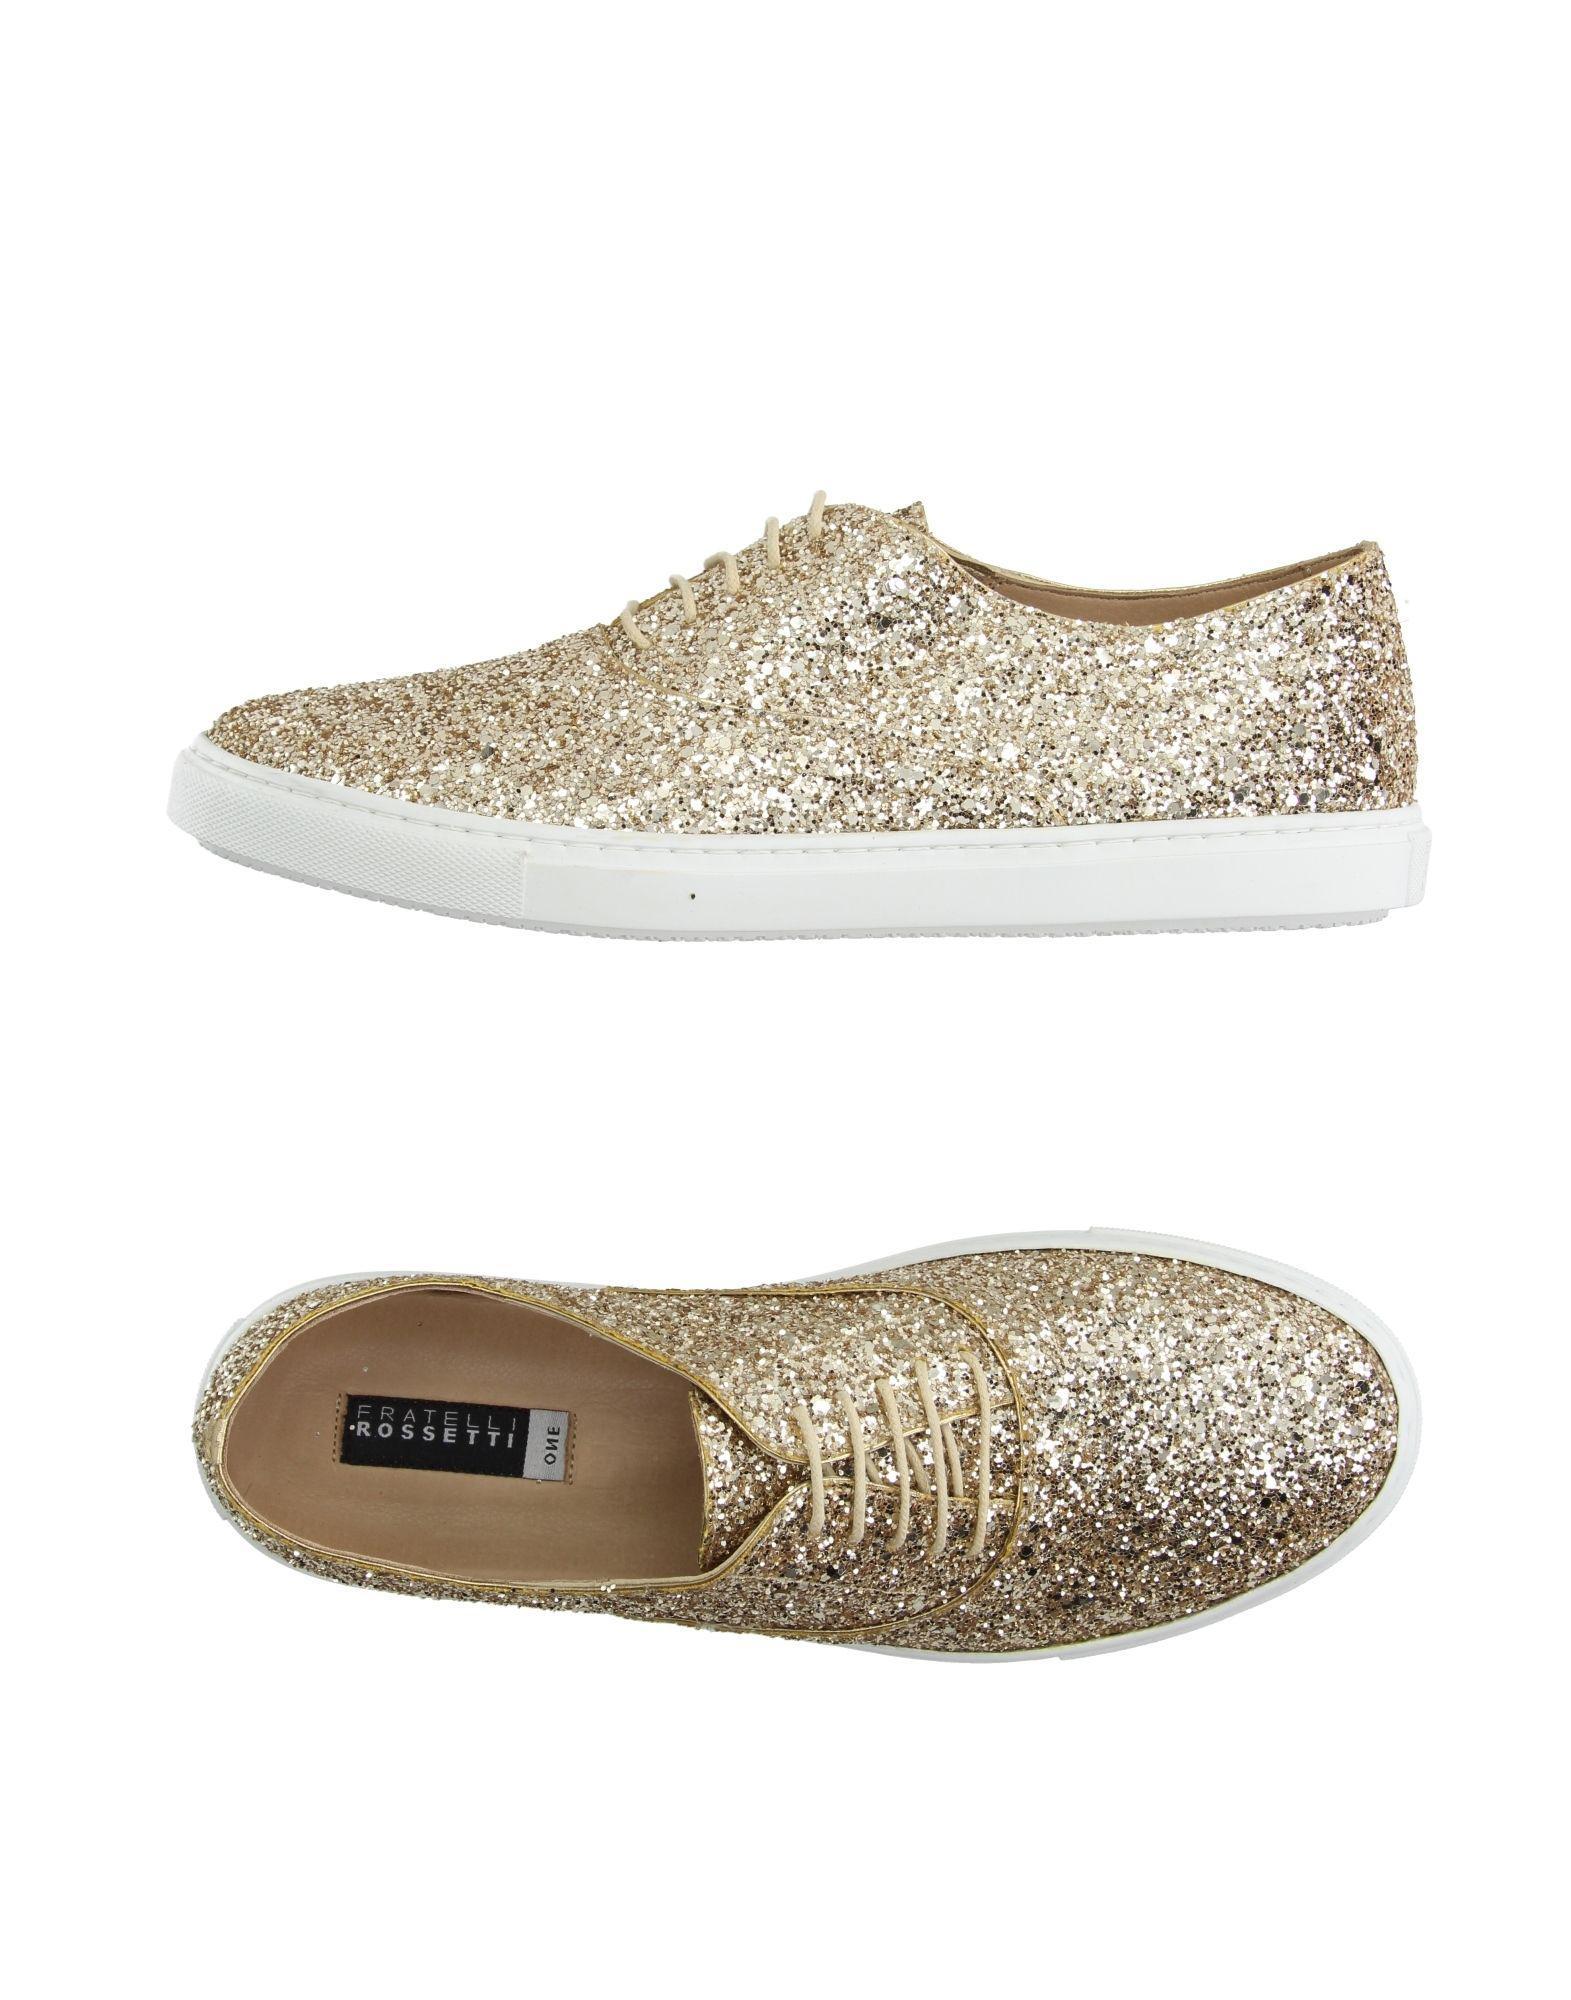 FOOTWEAR - Low-tops & sneakers Fratelli Rossetti fTsWBIM7d8